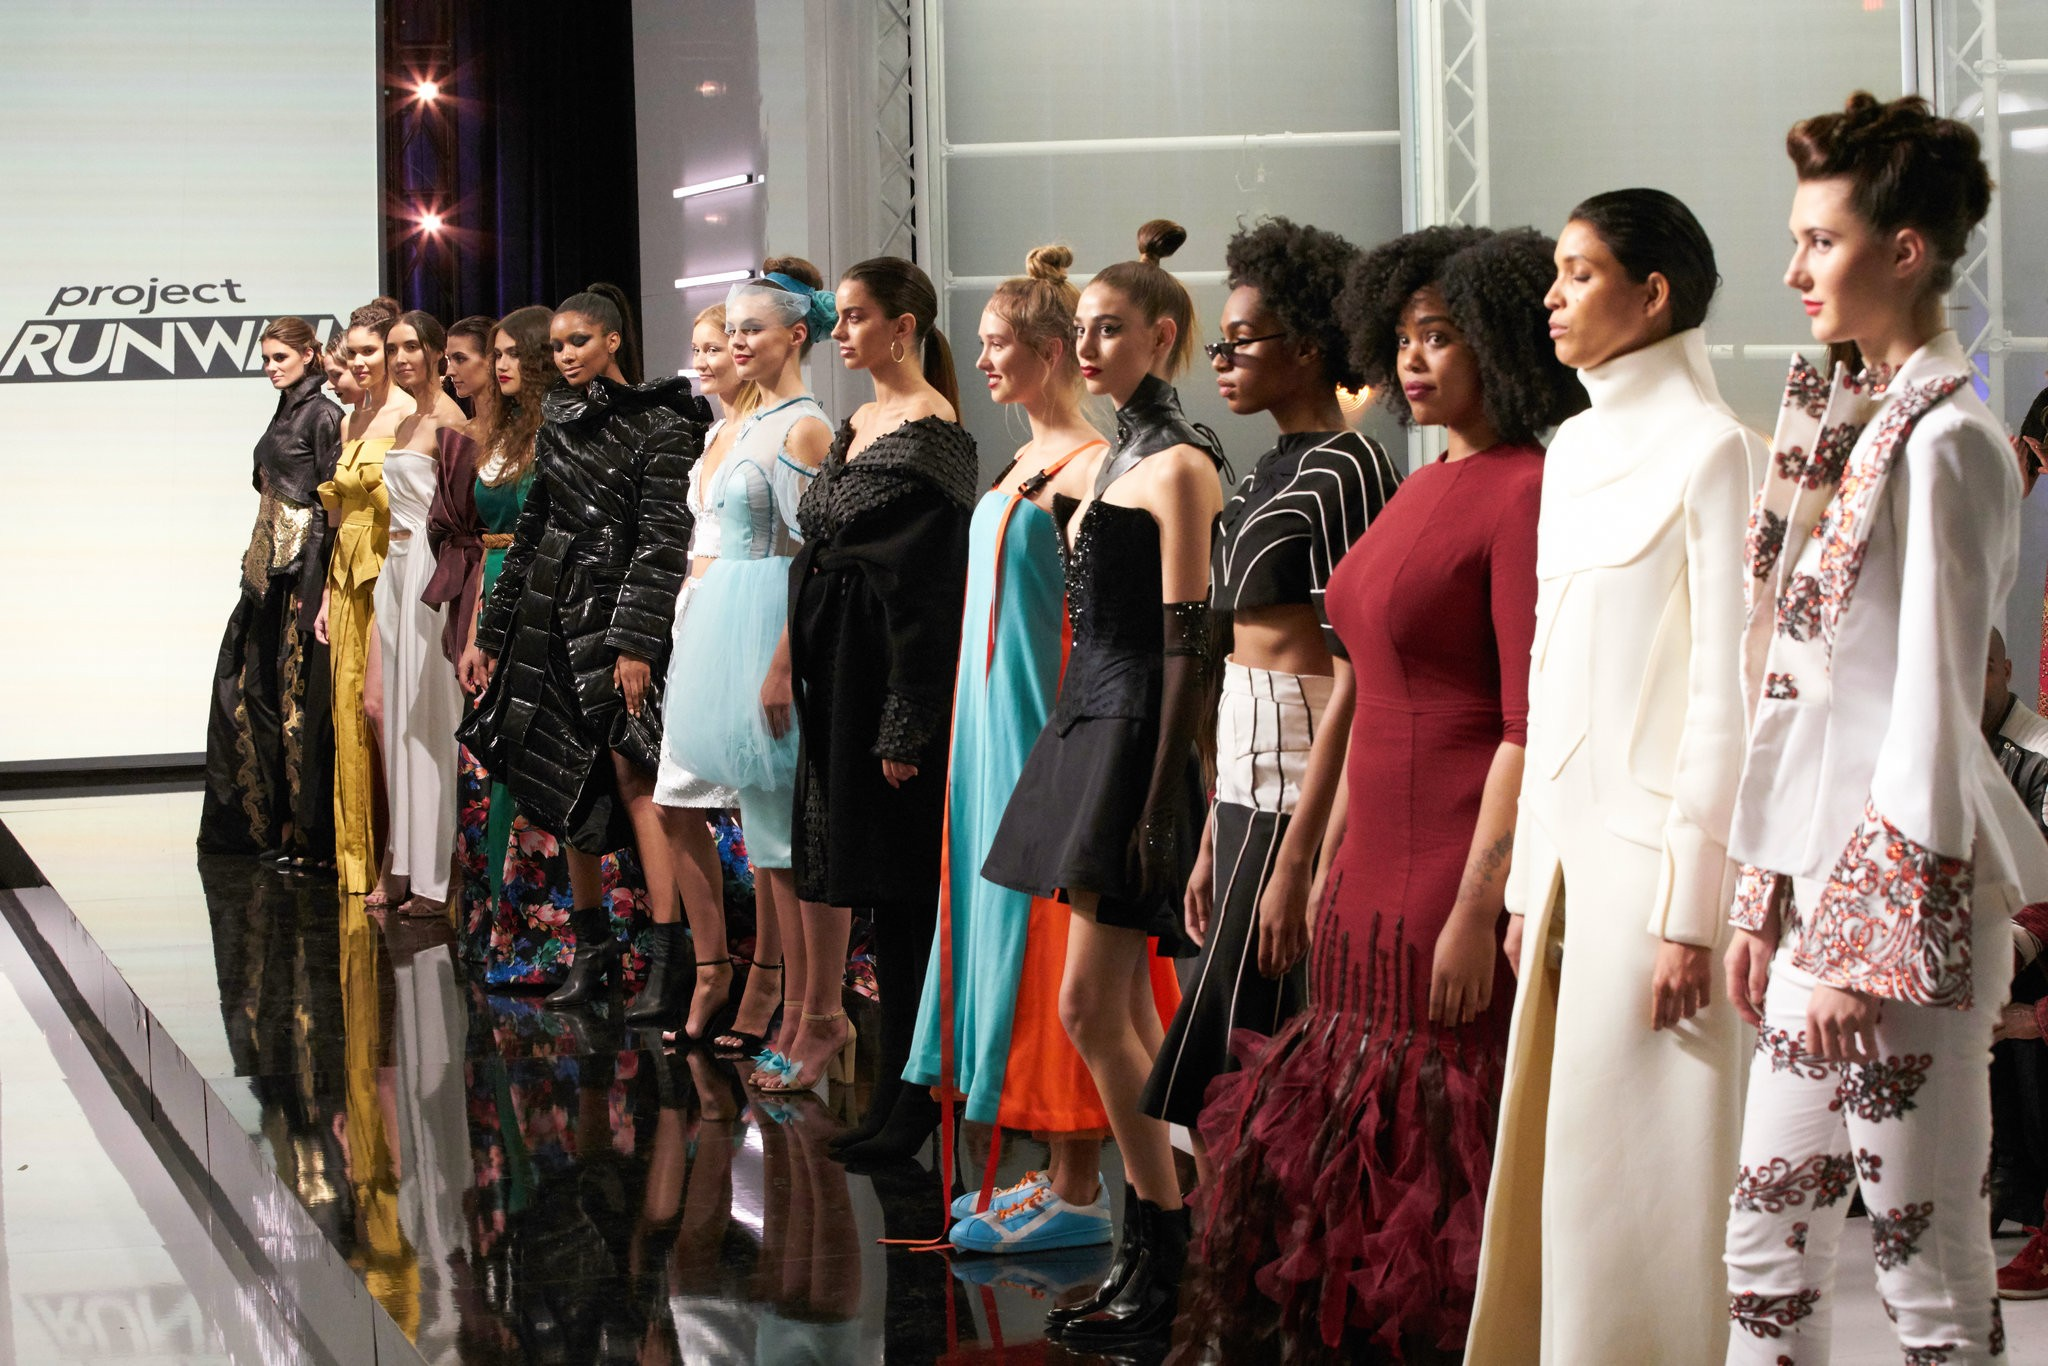 Project Runway Season 17 fashion show.